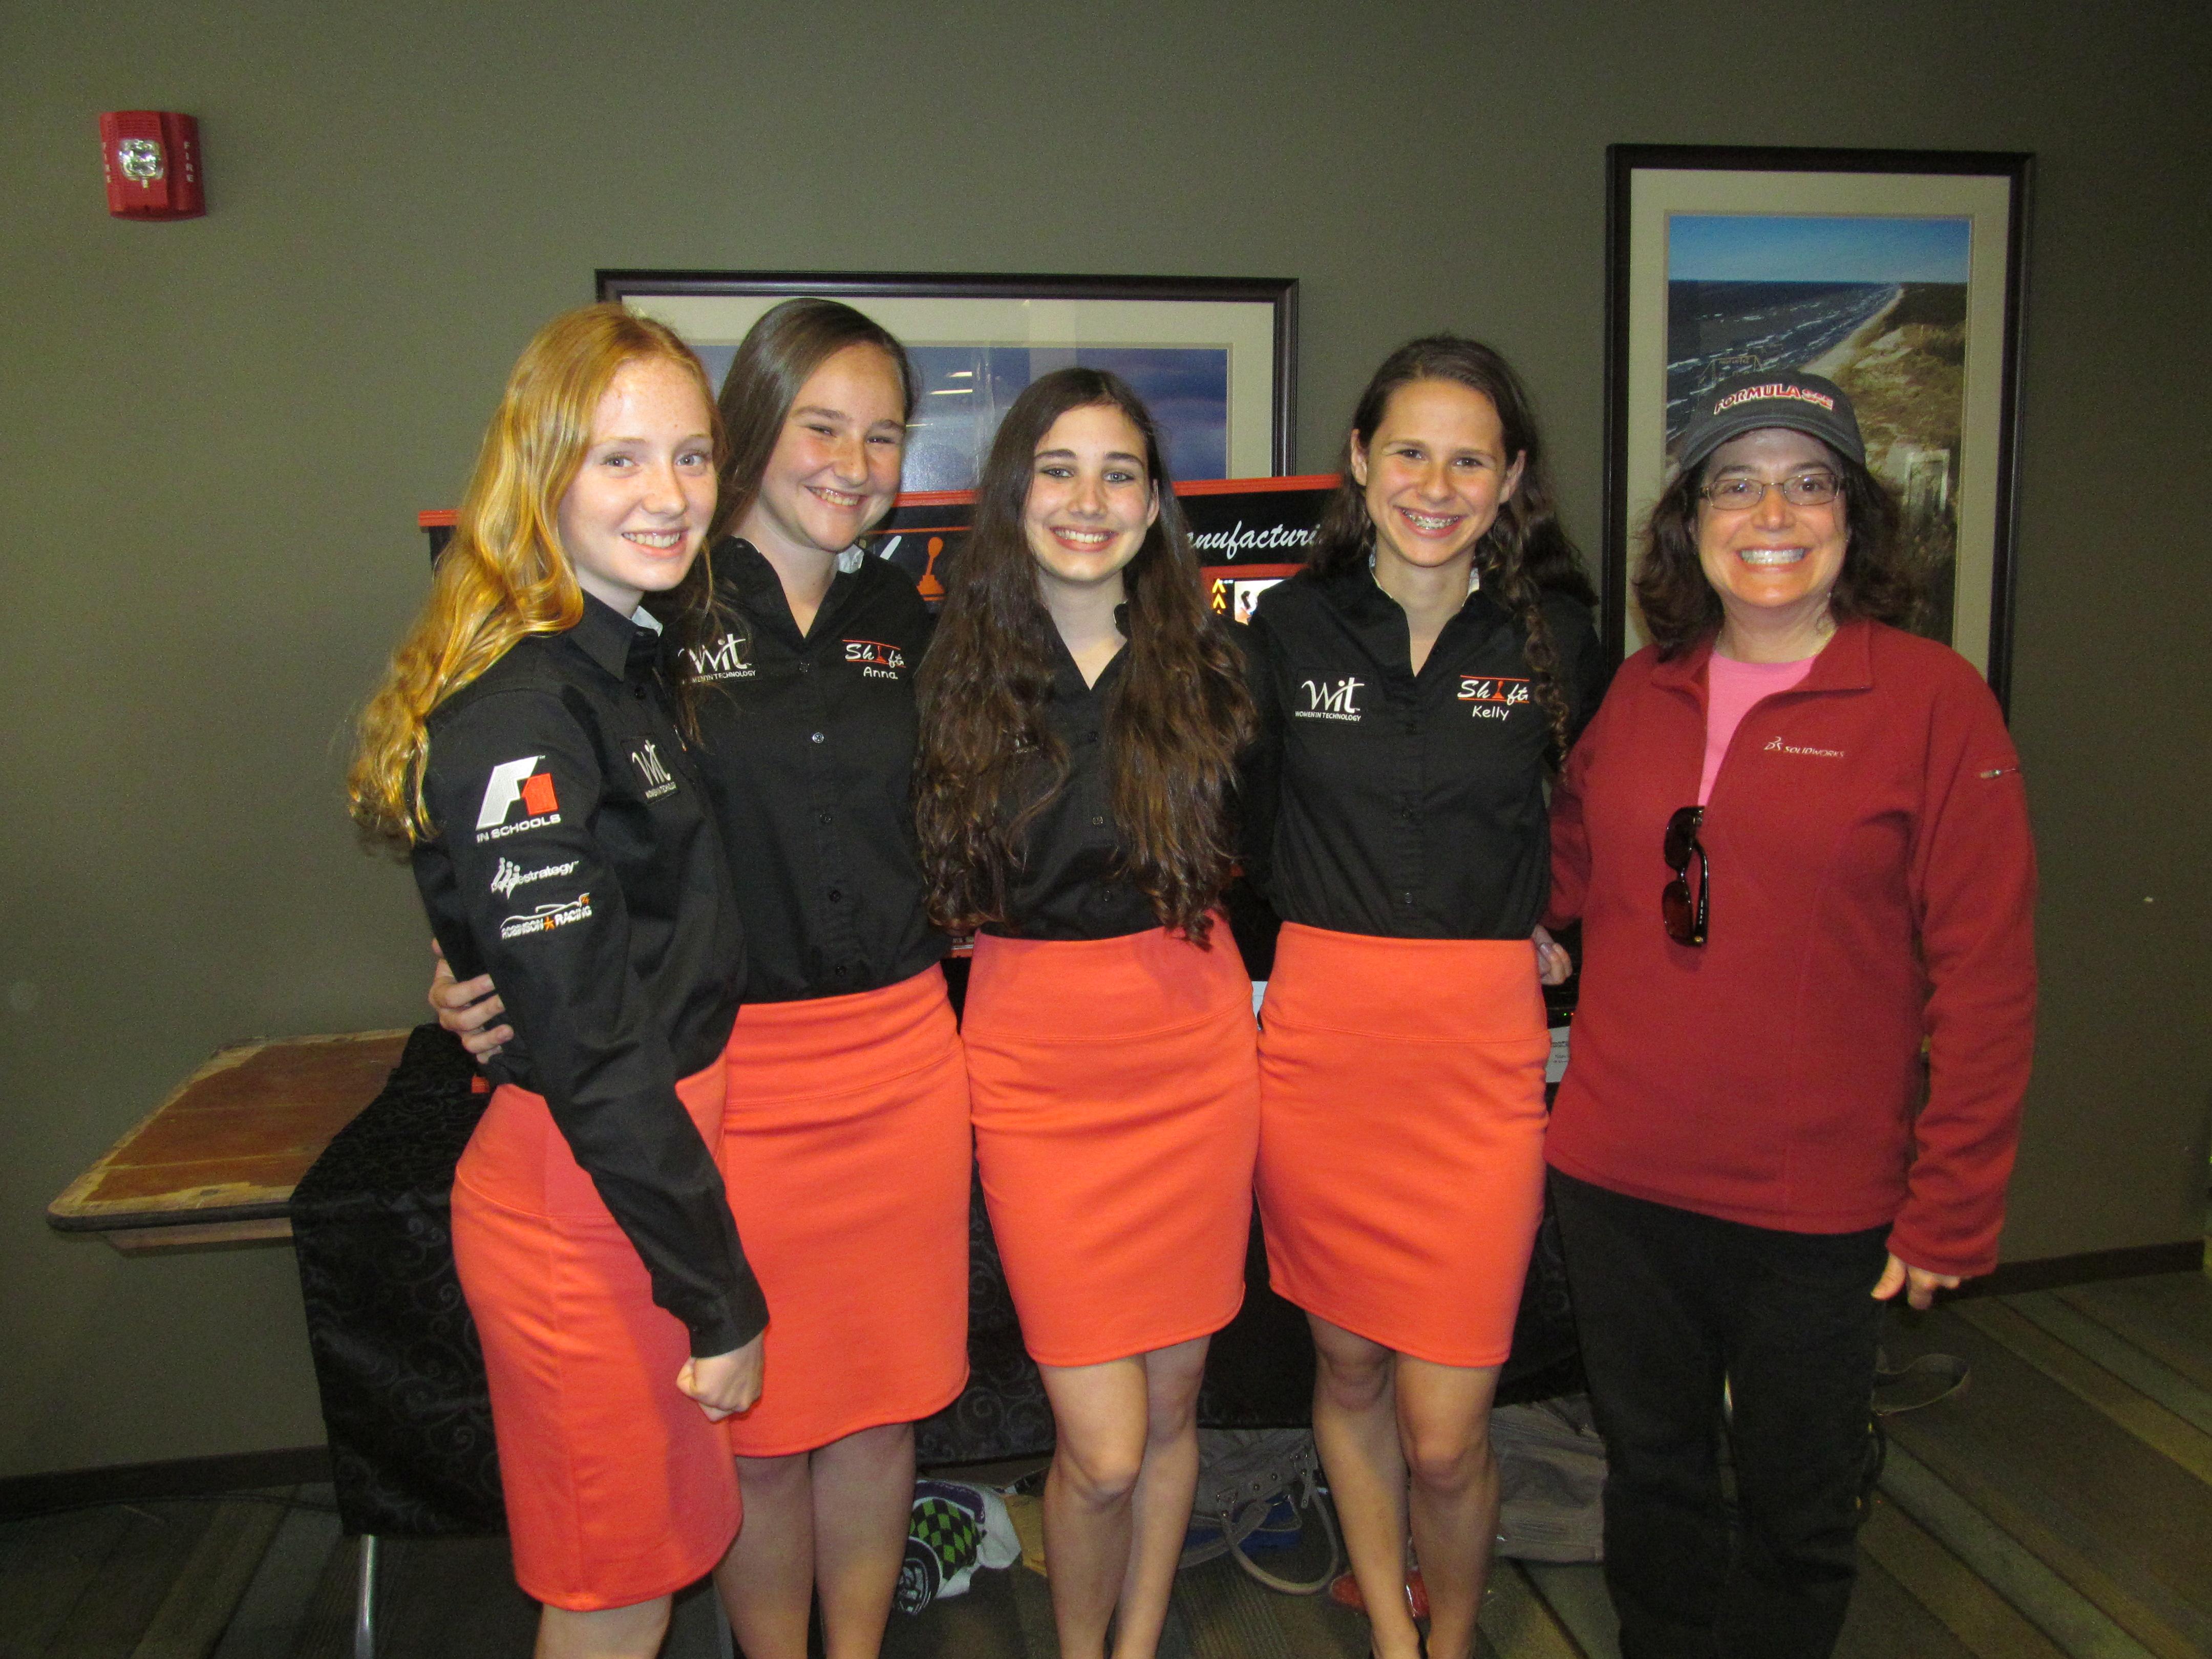 Formula SAE Michigan – students at their best